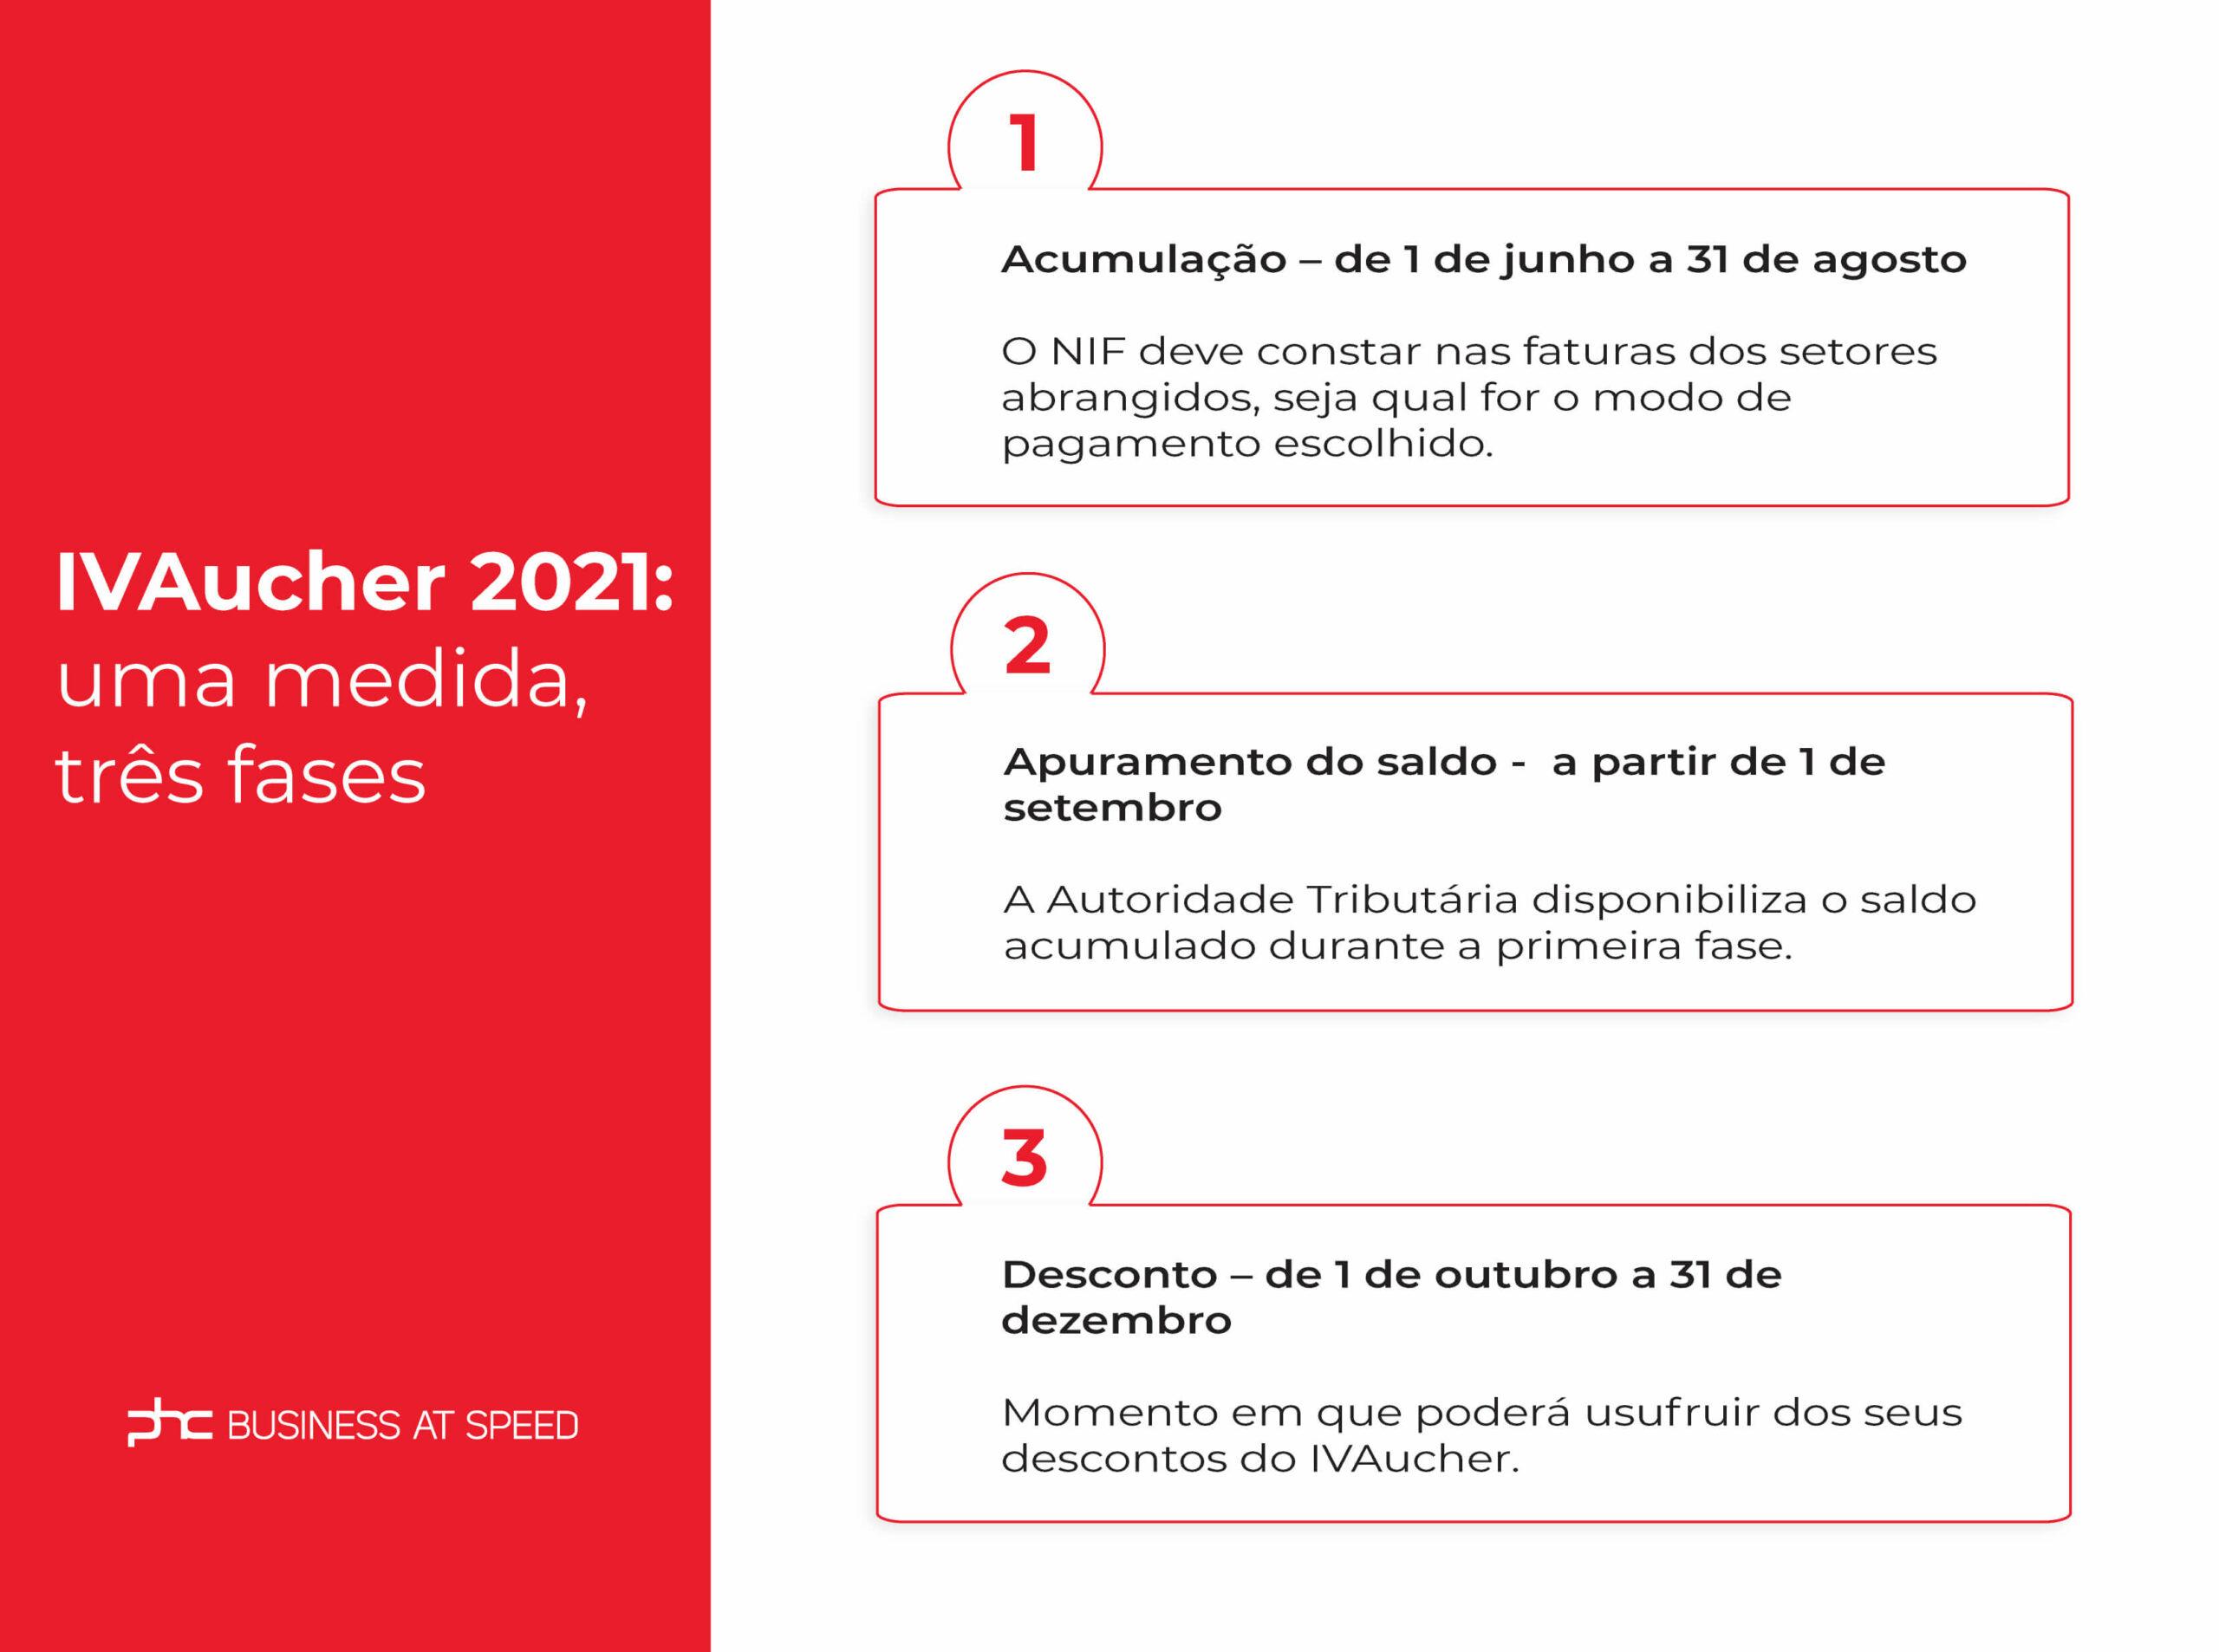 Datas do IVAucher 2021